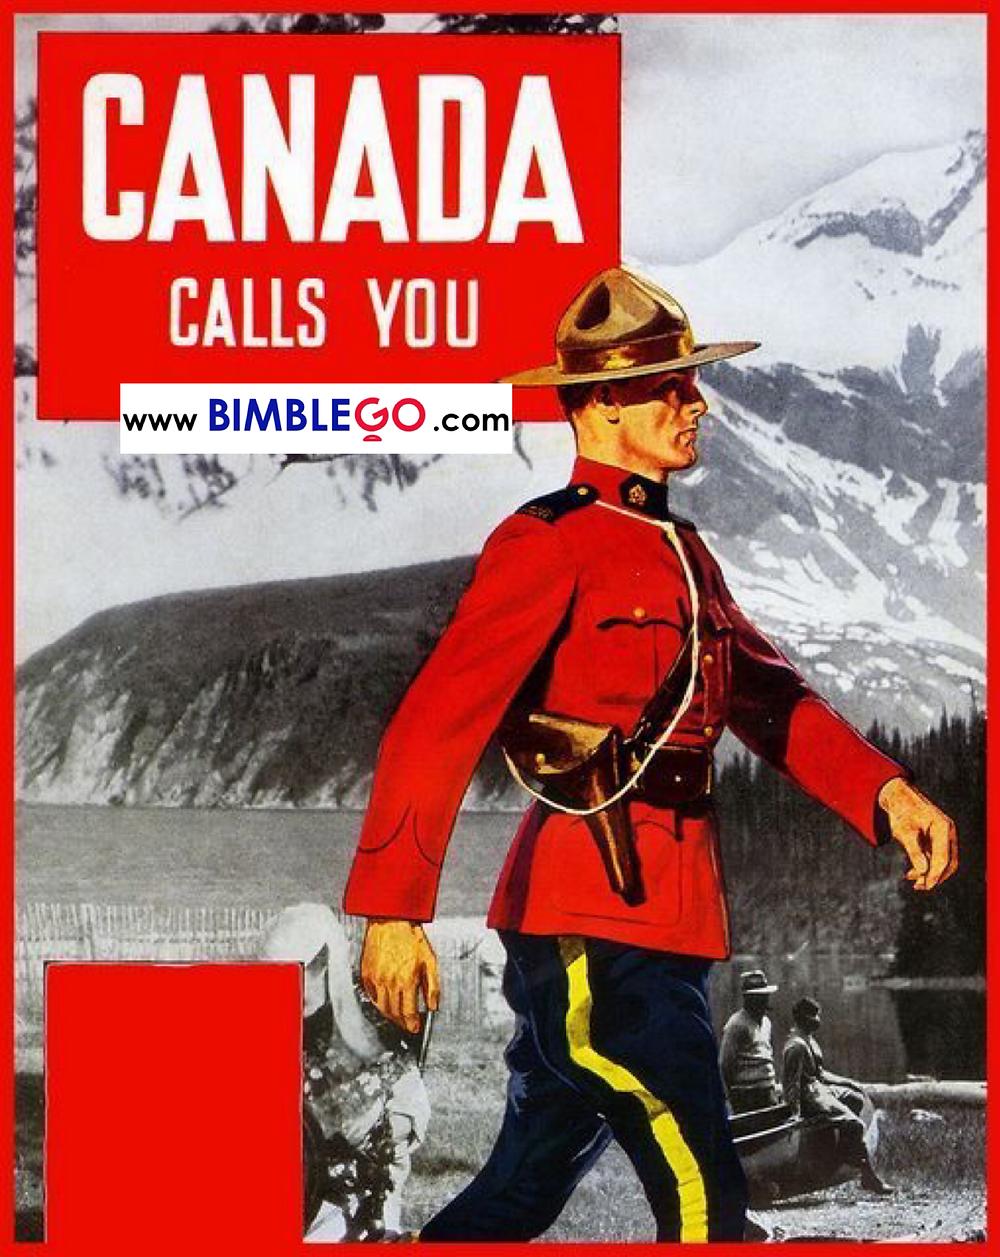 Secure your family's future! Permanent residence CANADA. CALL NOW!!!! #canada #immigration #settleabroad #PNP #newlife #alberta #cic #bimblego #gurgaon #delhi #india #studyabroad #education #college #canadianimmigration #canadiannews #permanentresidence #studyvisa #bimblegoimmigration #toronto #cicnews #citizenship #canadavisa #immigrationlawyer